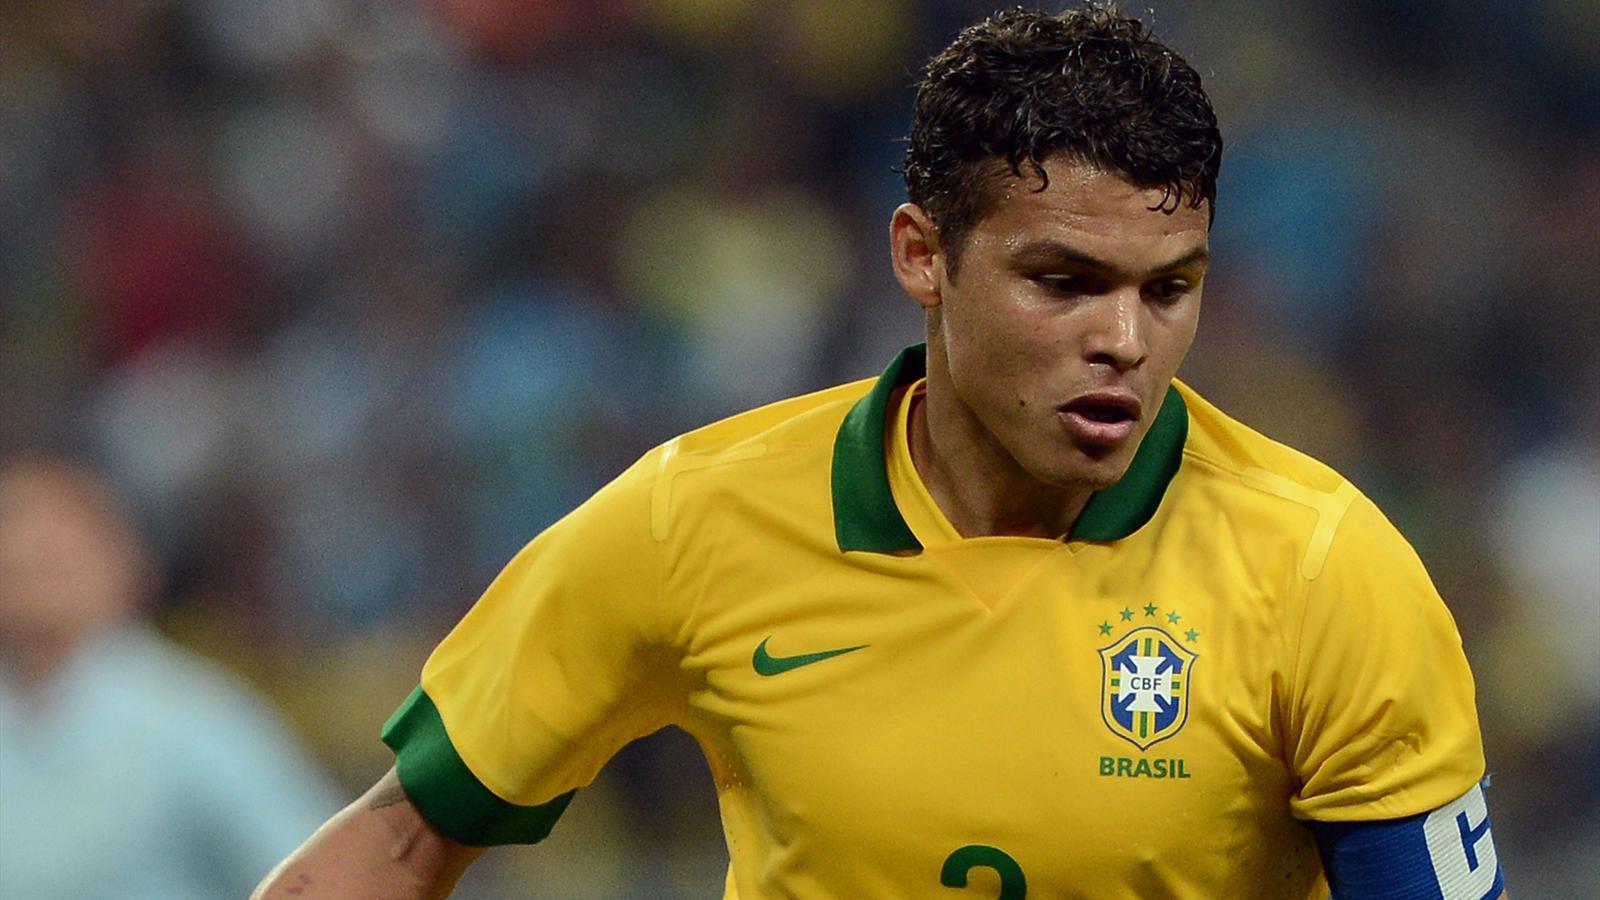 No Barca agreement for Thiago Silva says agent Liga 2011 2012